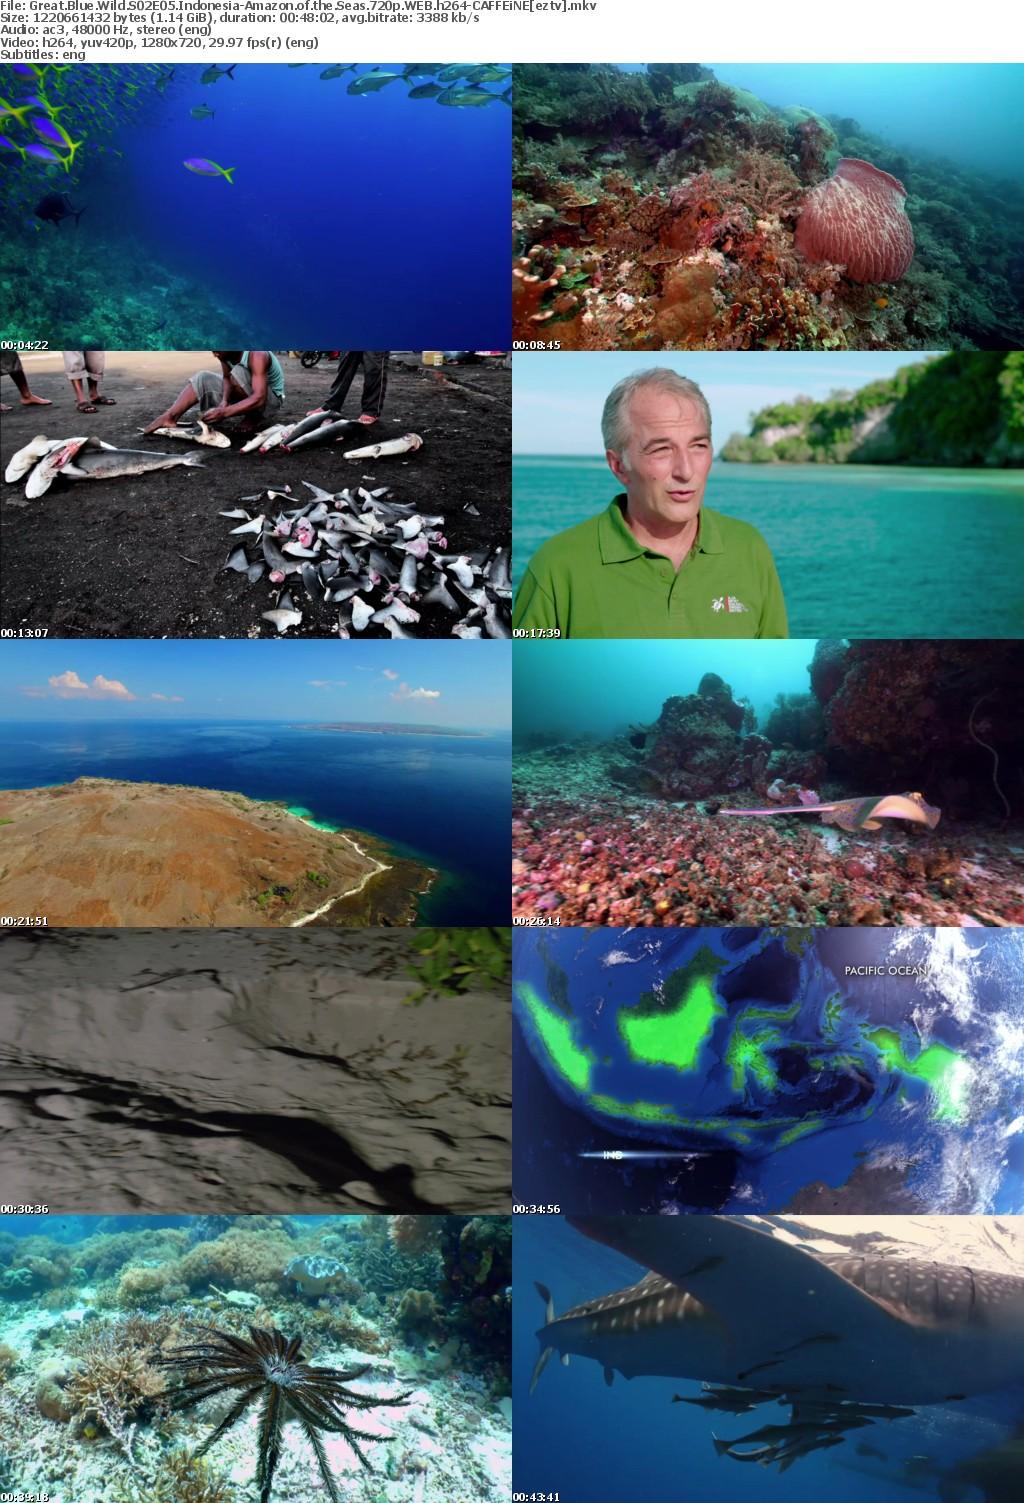 Great Blue Wild S02E05 Indonesia-Amazon of the Seas 720p WEB h264-CAFFEiNE